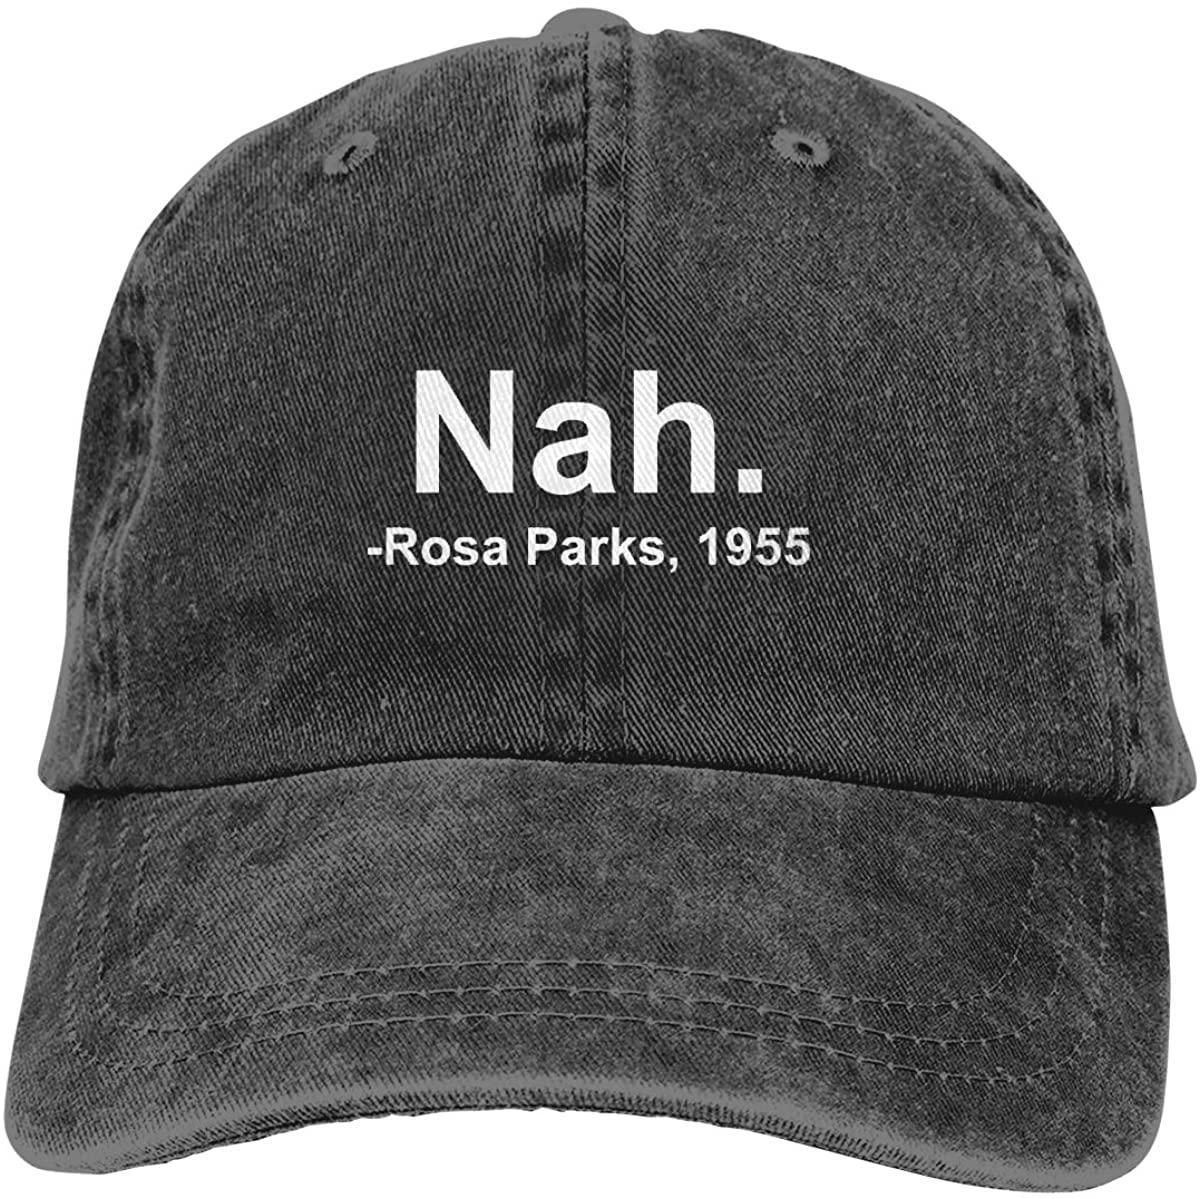 Denim Cap Nah. Rosa Parks, 1955 Baseball Dad Cap Classic Adjustable Sports for Men Women Hat